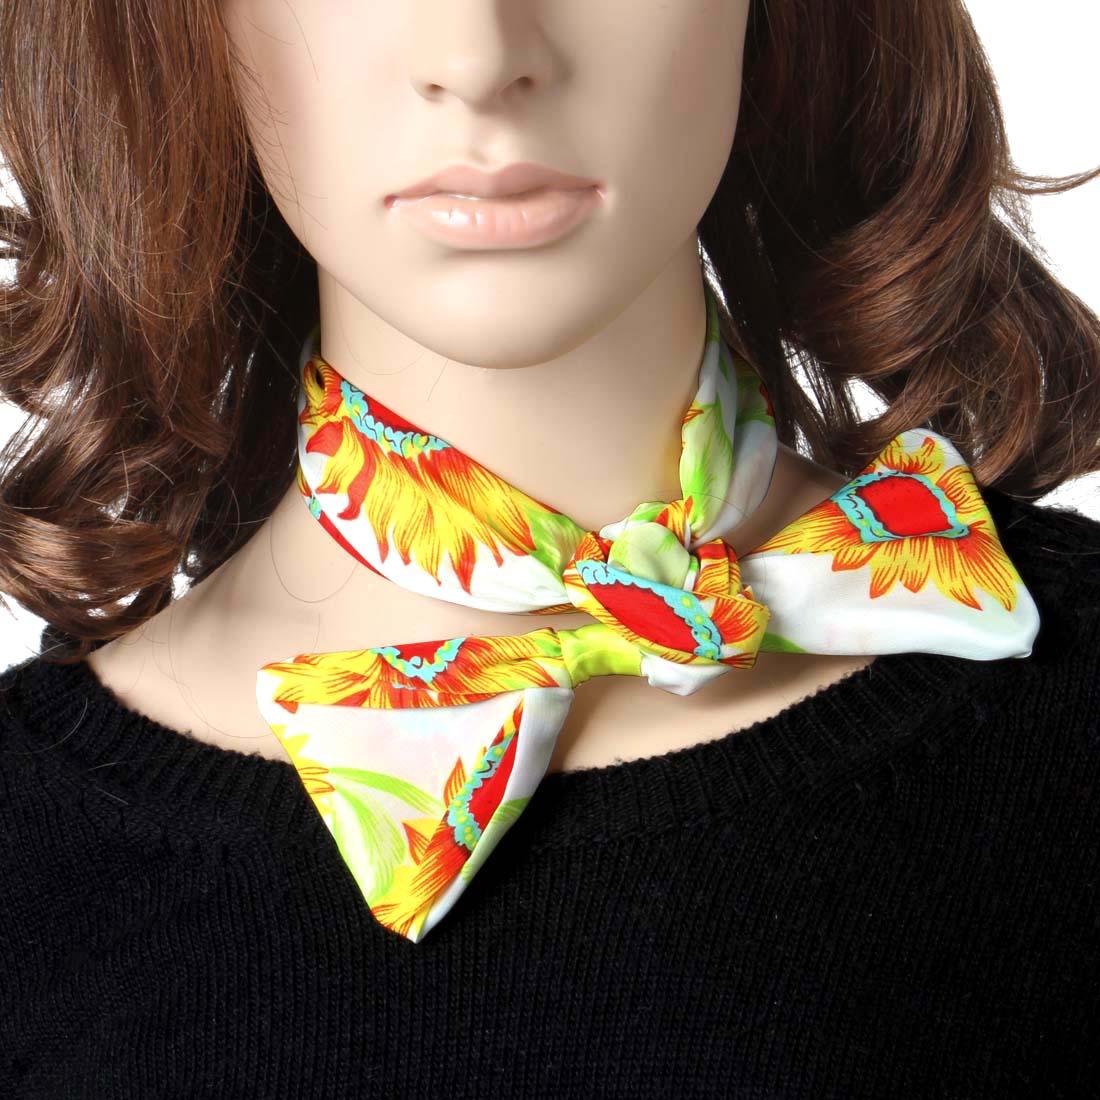 bmc 10pc mixed design wired hair tie twist bow headband